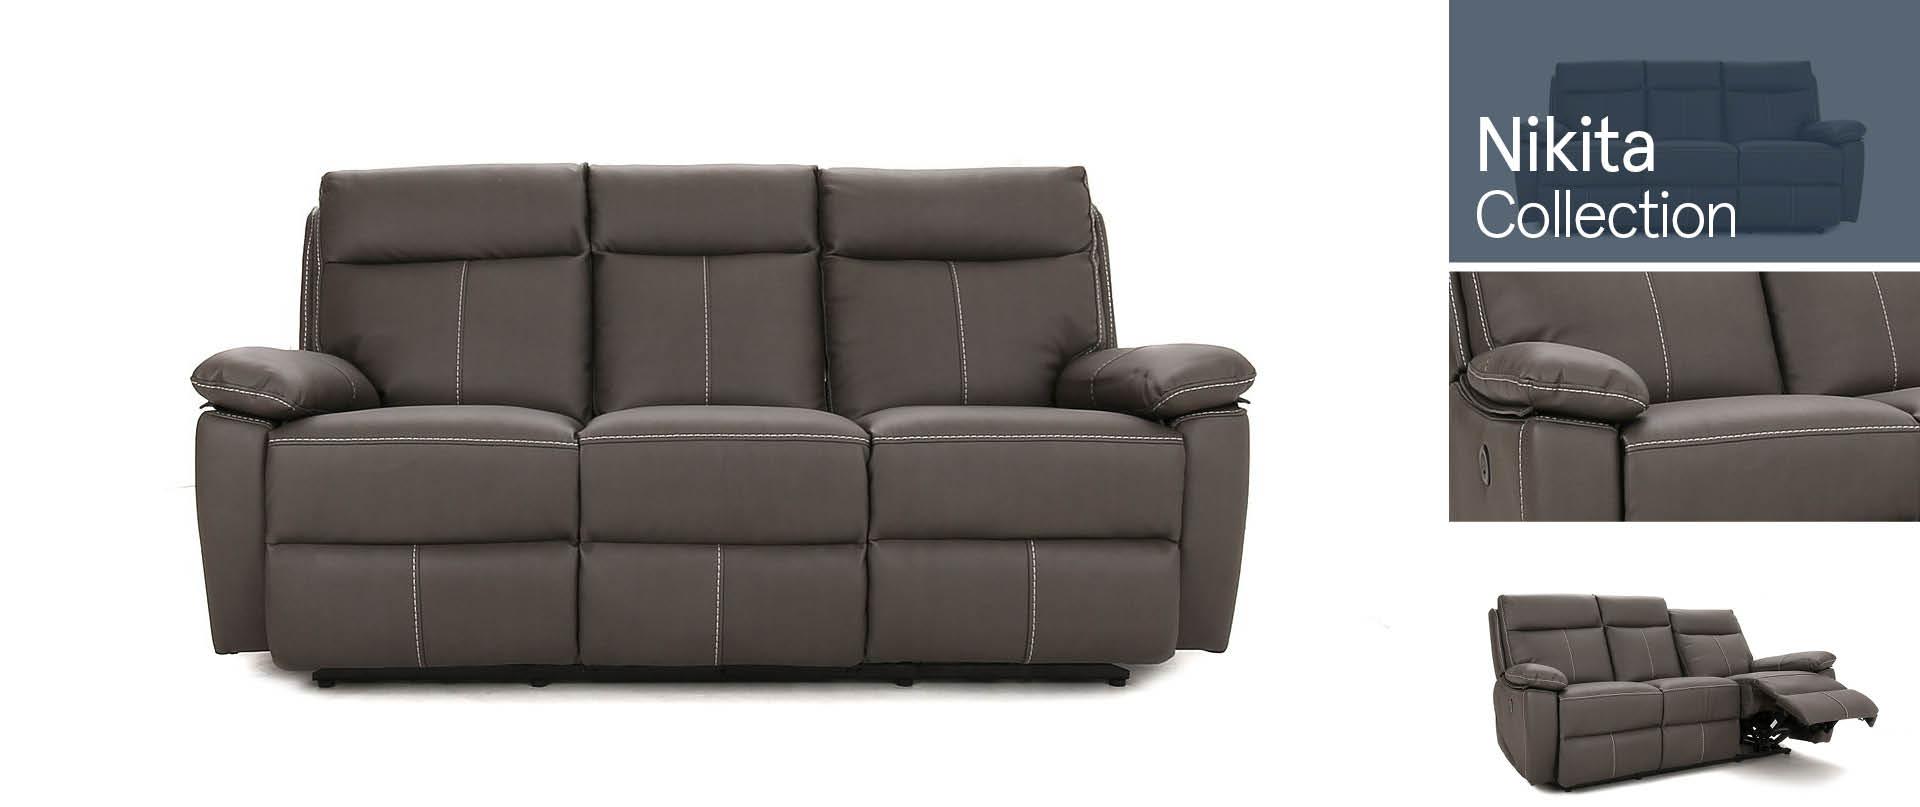 Nikita All Fabric Sofa Ranges